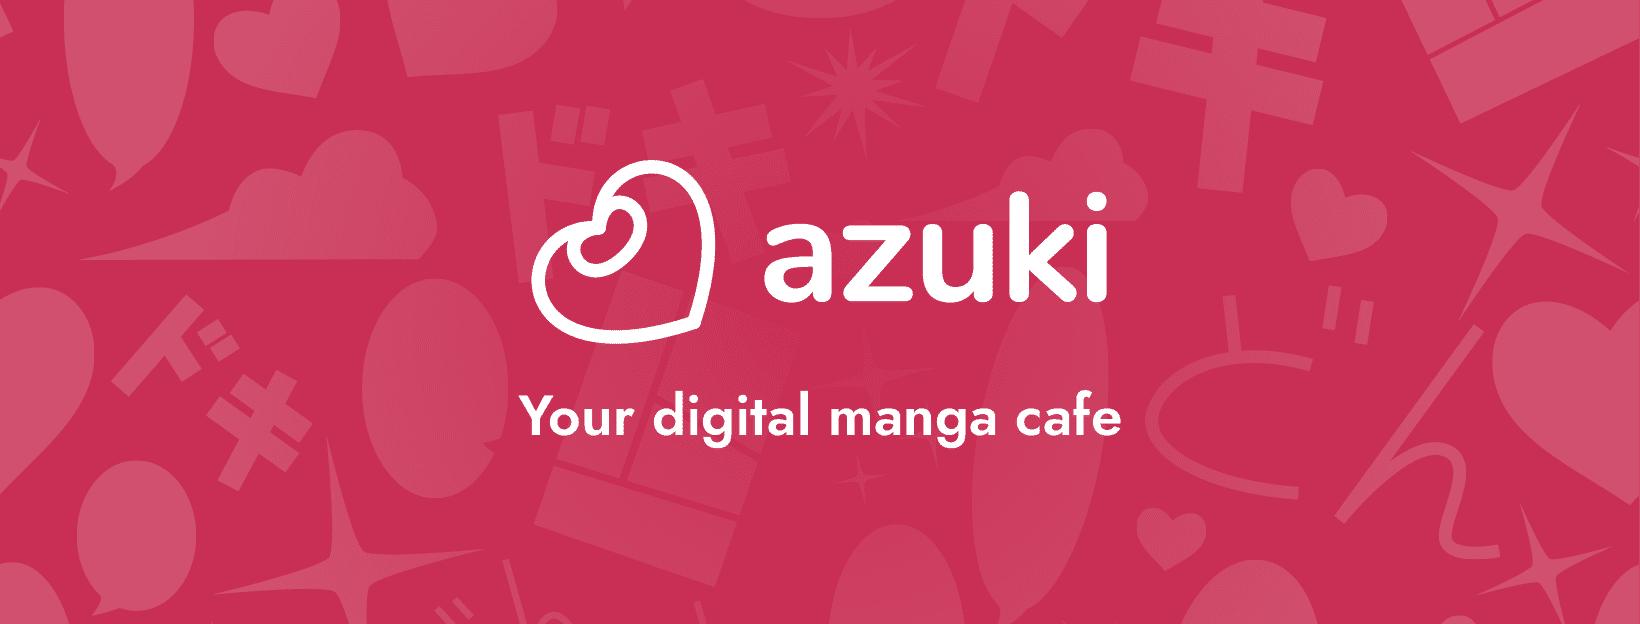 Azuki CEO Shares Origin Story Of The New Digital Manga Streaming Service, Launches June 28